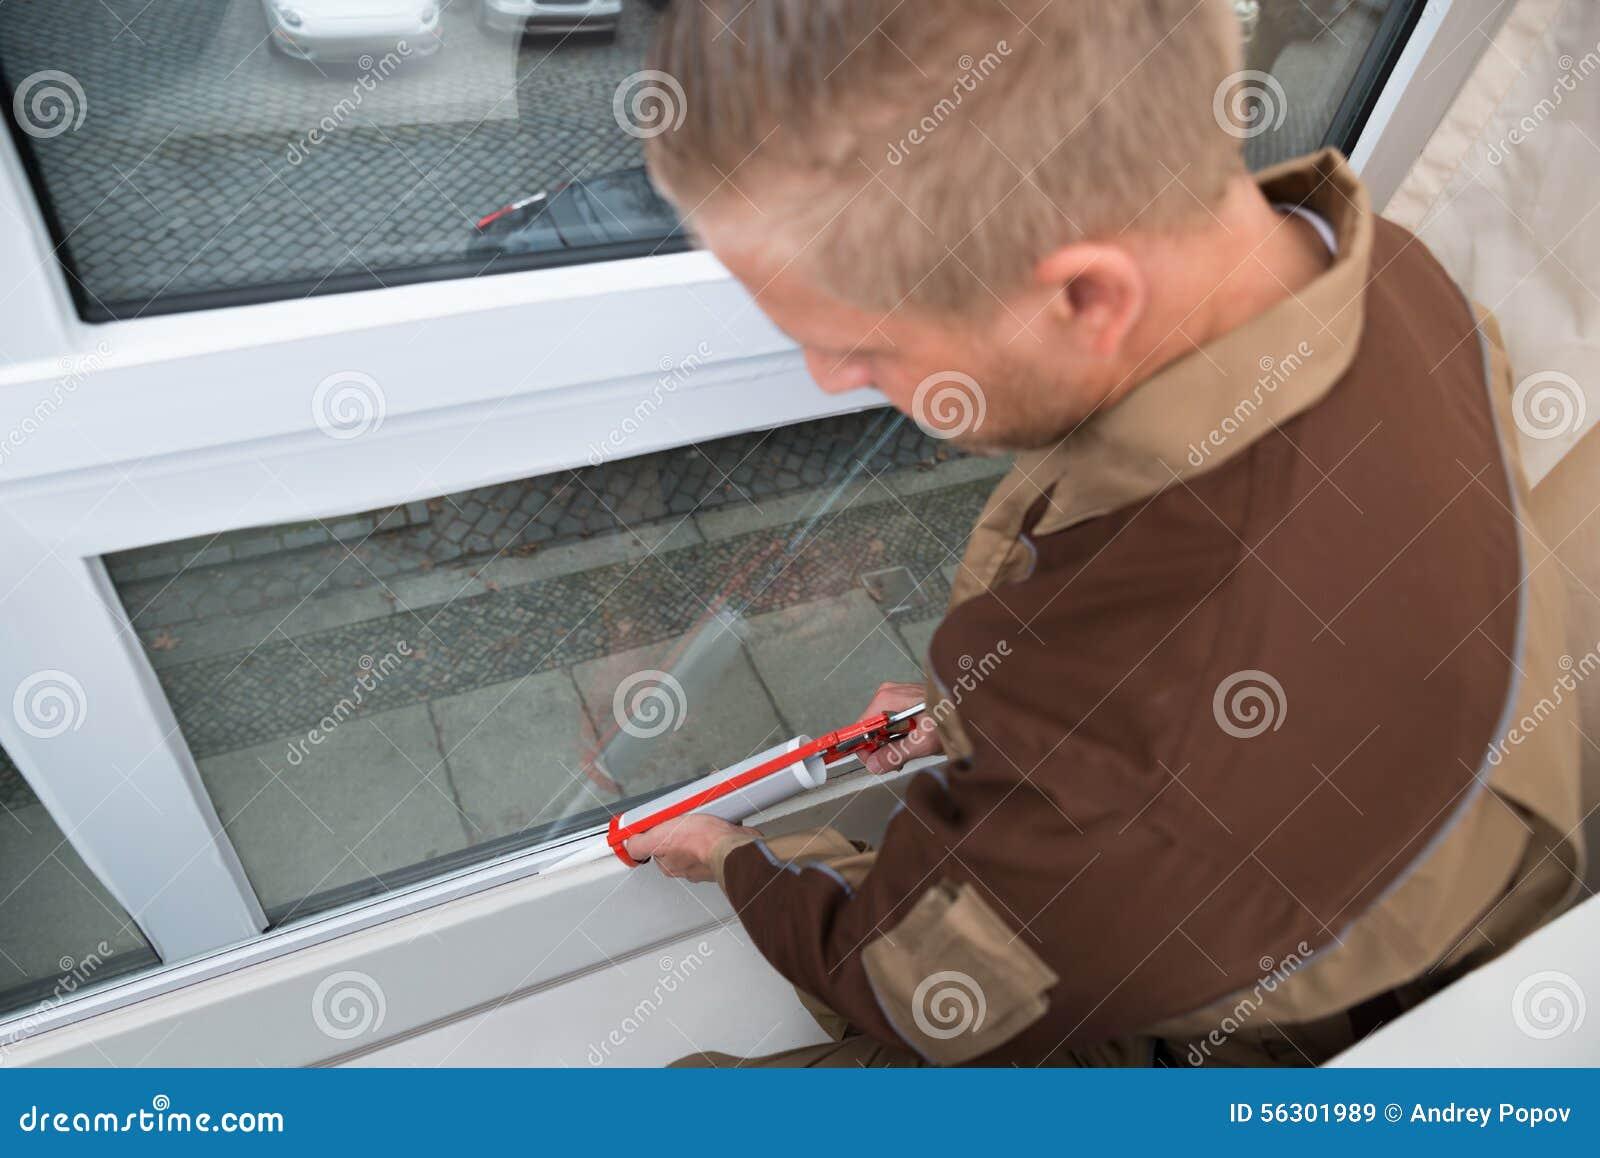 Person Applying Silicone Sealant